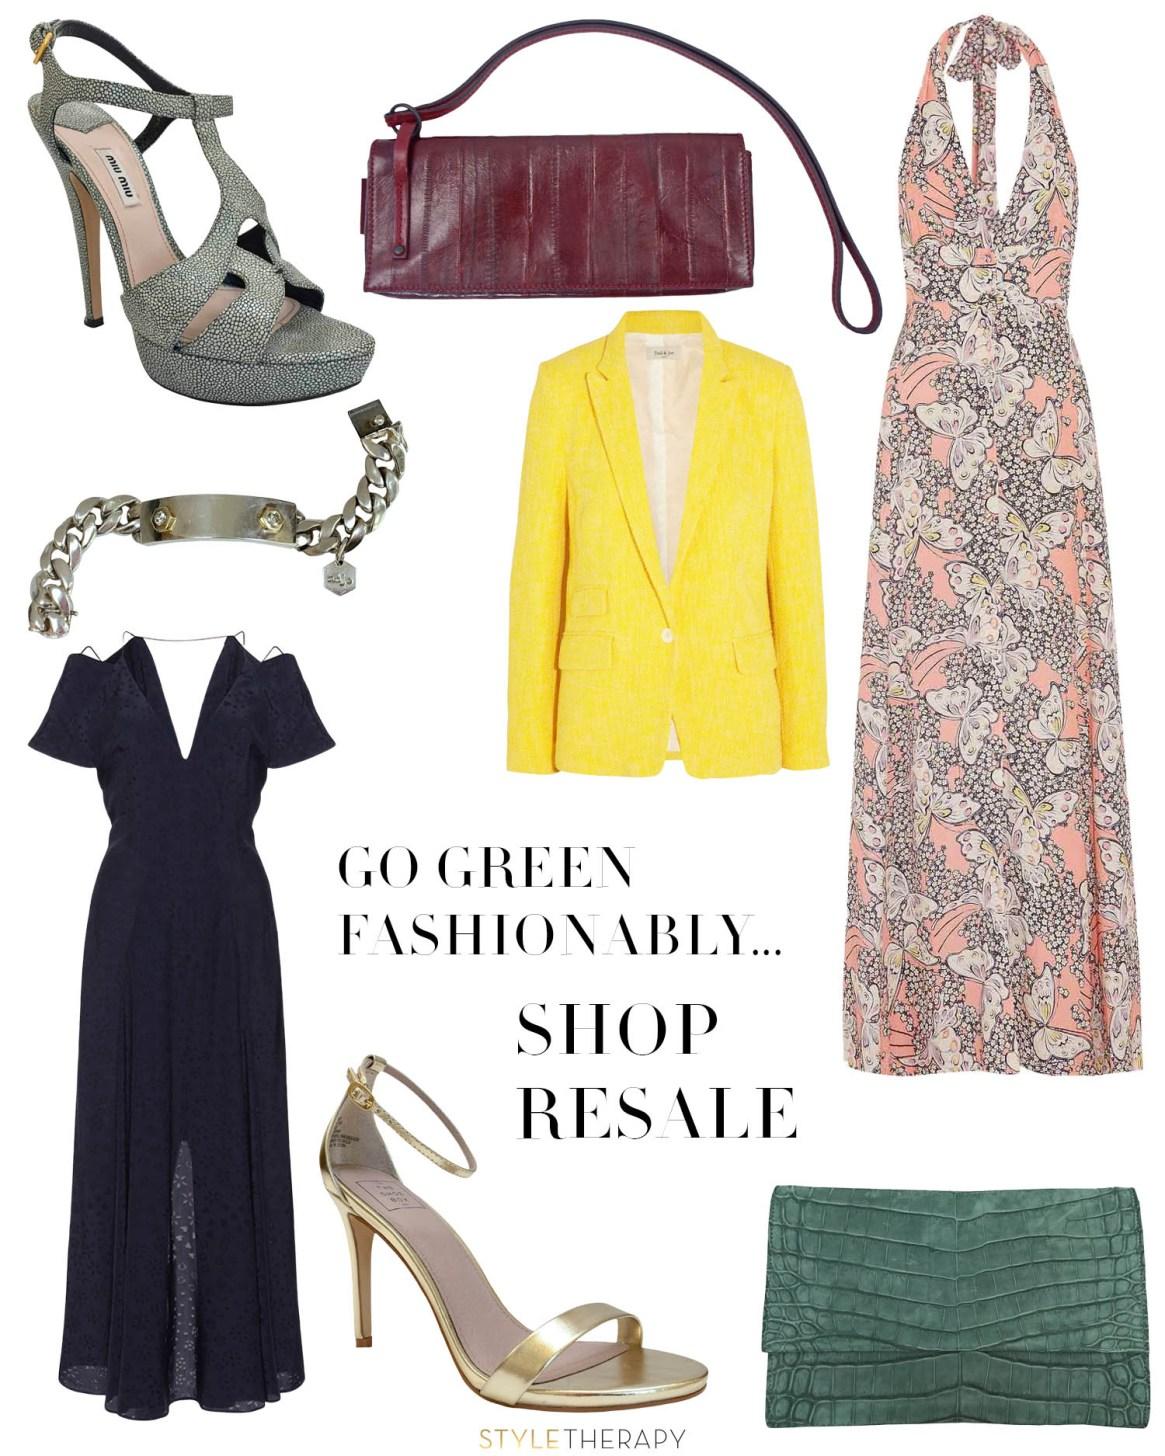 Go Green Fashionably Shop Resale